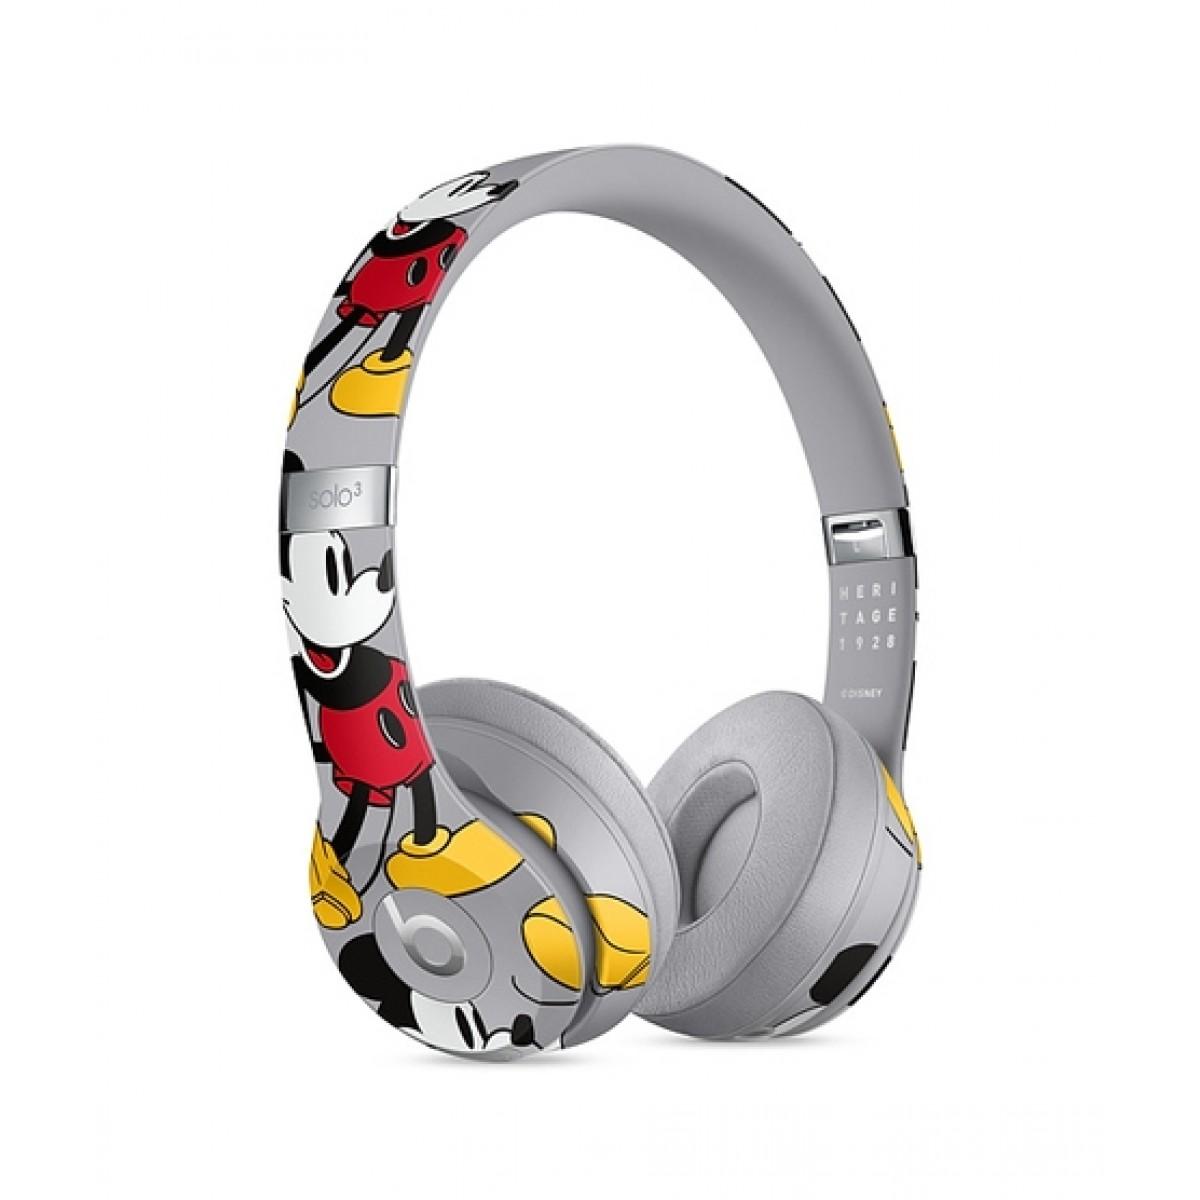 Beats Solo 3 Wireless On Ear Headphones Price In Pakistan Buy Beats Solo 3 Mickey S 90th Anniversary Edition Bluetooth On Ear Headphones Ishopping Pk